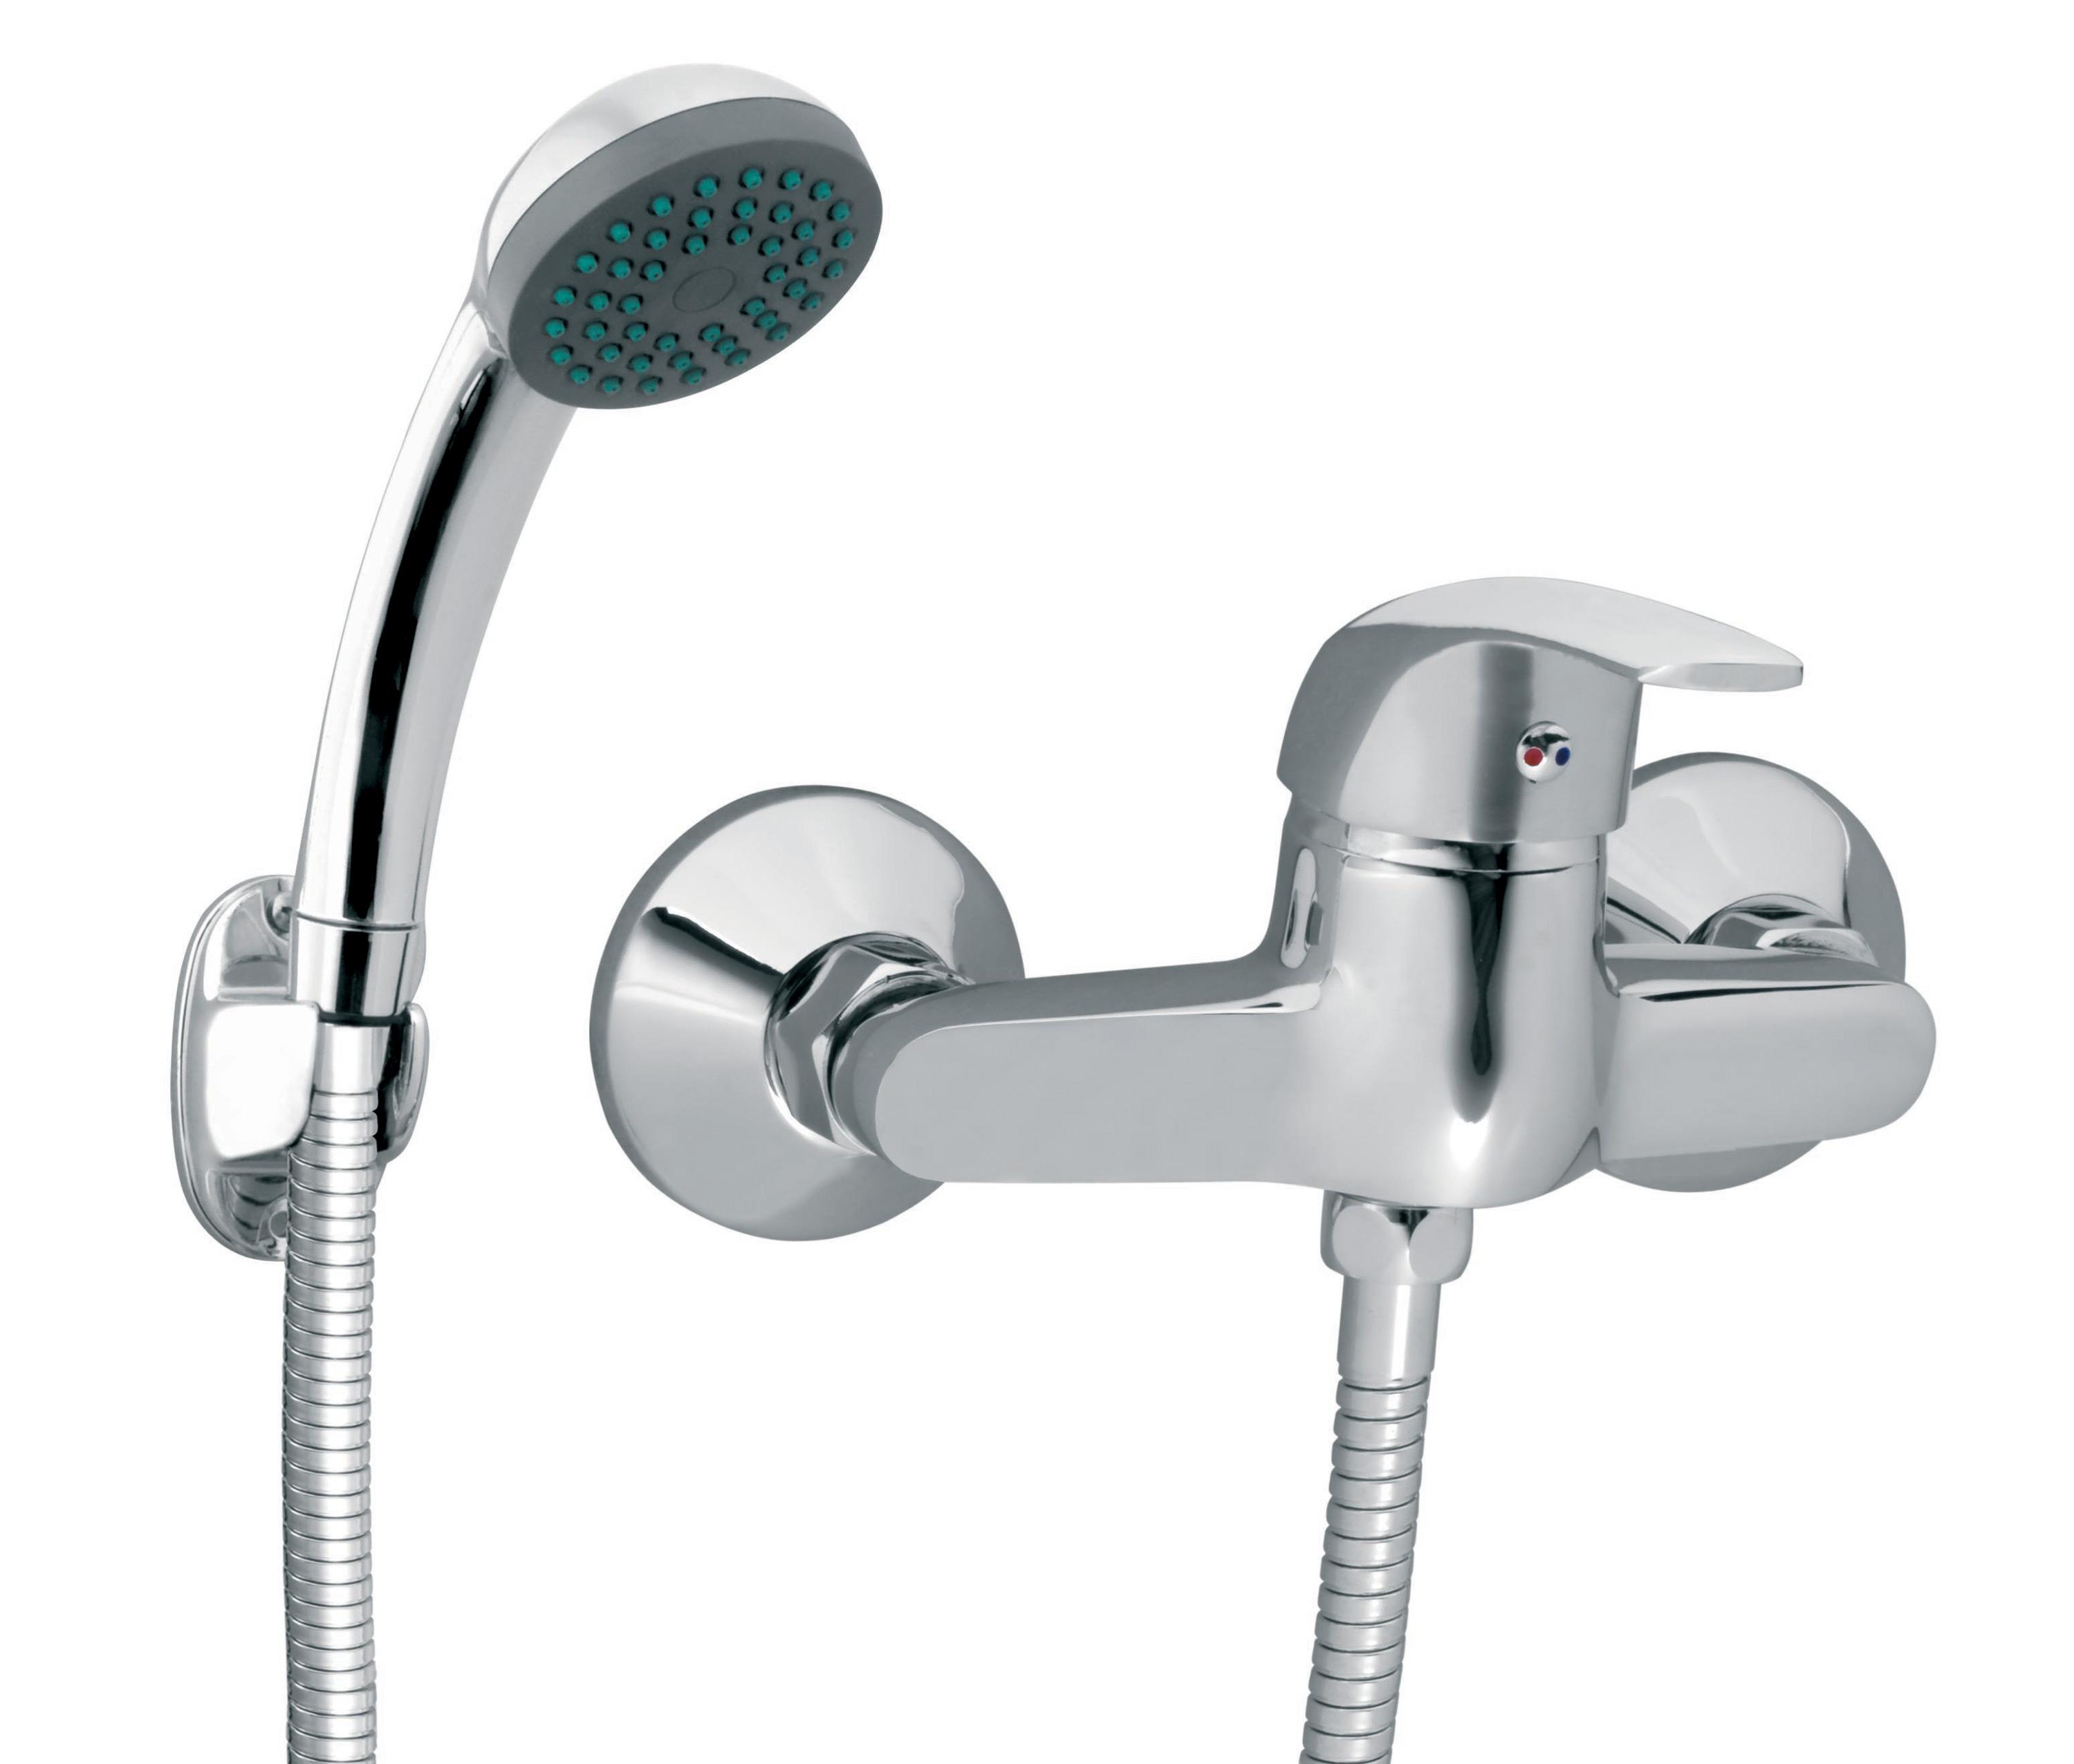 Bathroom & Kitchen Faucets, Sun Hee Hardware & Electrical DIY Shop ...